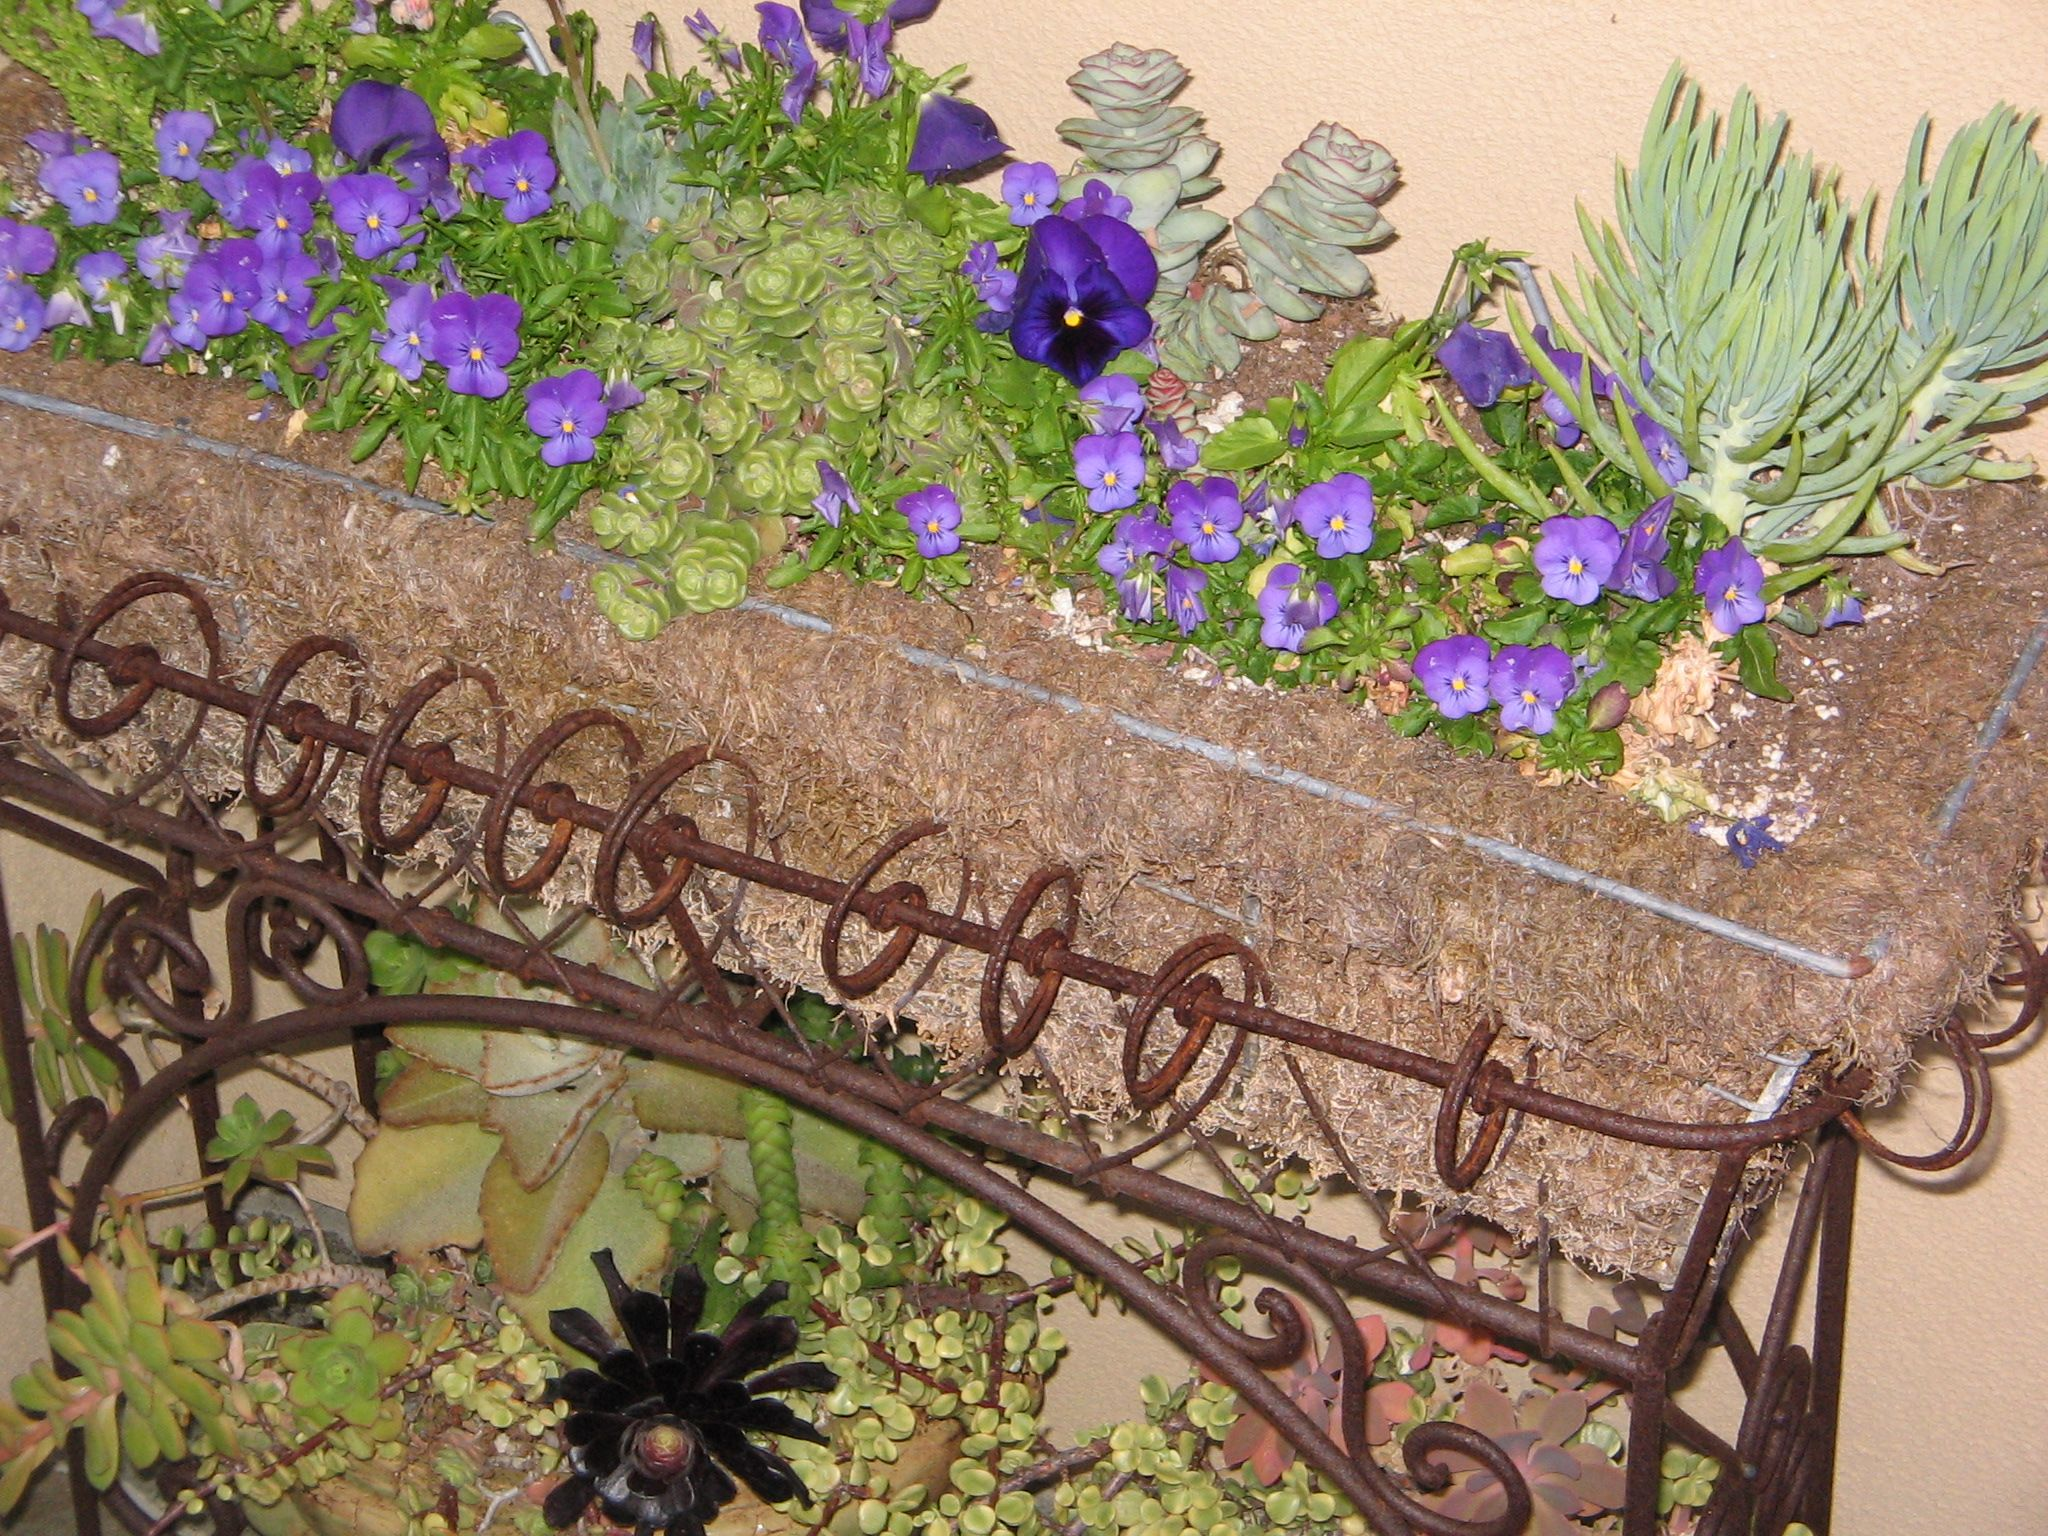 Garden Flower Planter Ideas And Diy Projects Pinterest